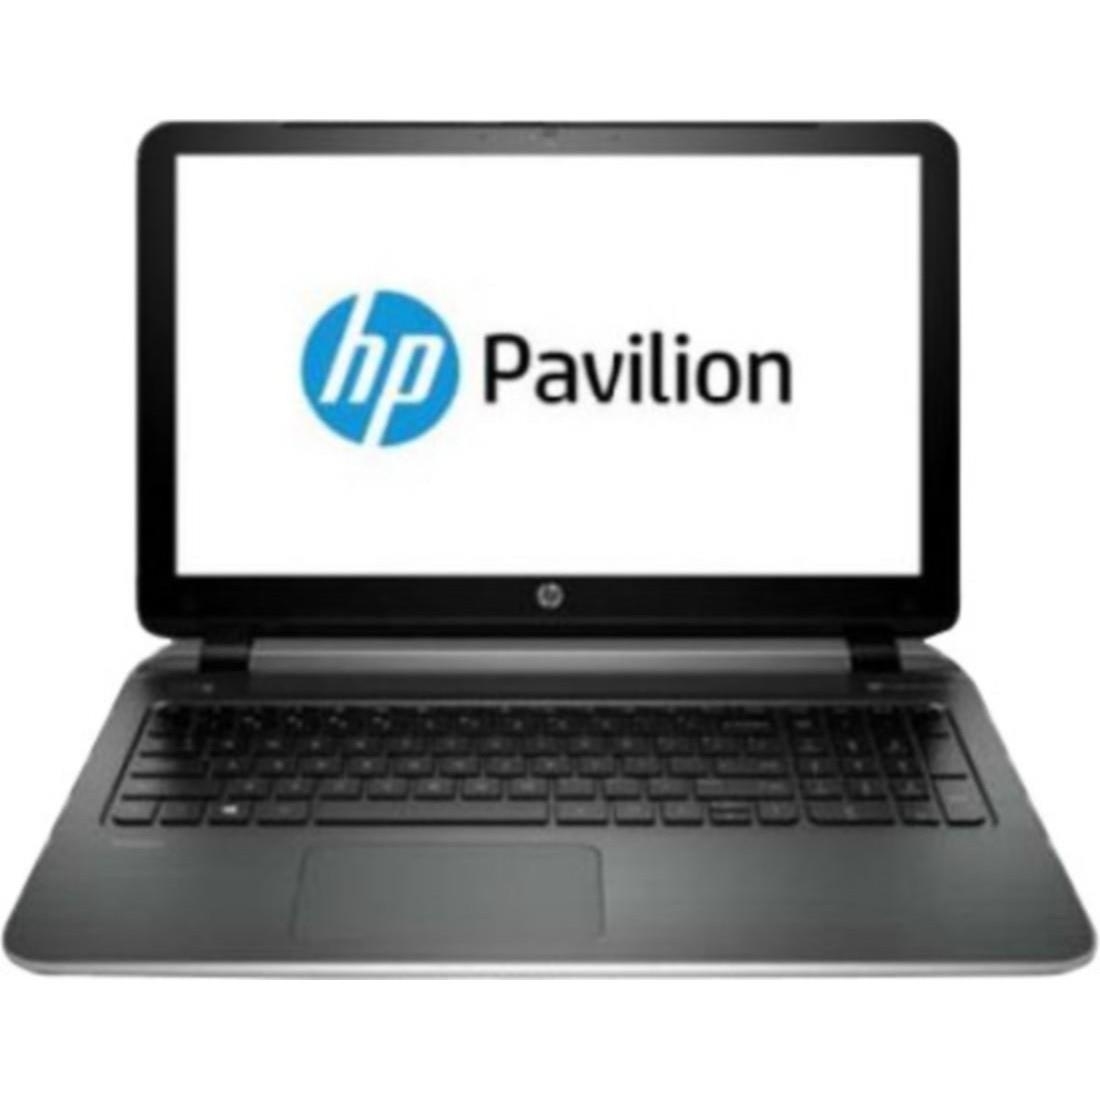 HP Pavilion 15 p208TX Notebook (K8U20PA) Image